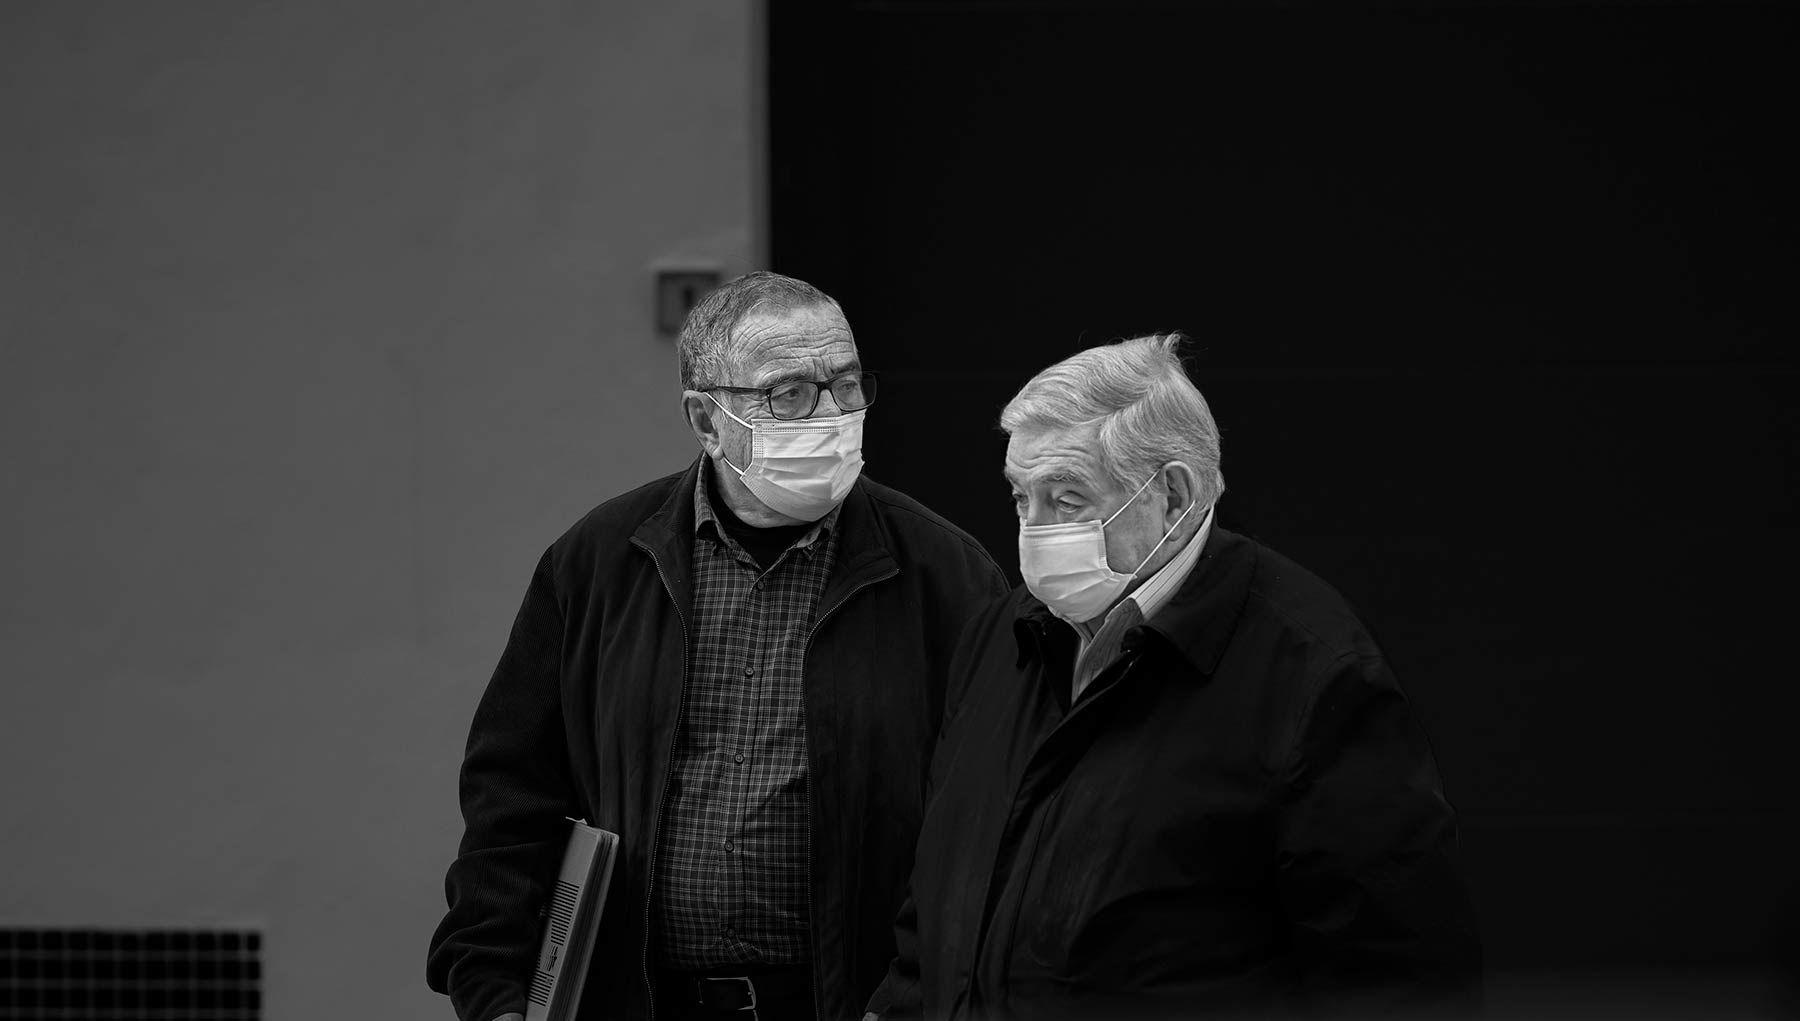 B&N- 16: Hermanos con mascarilla